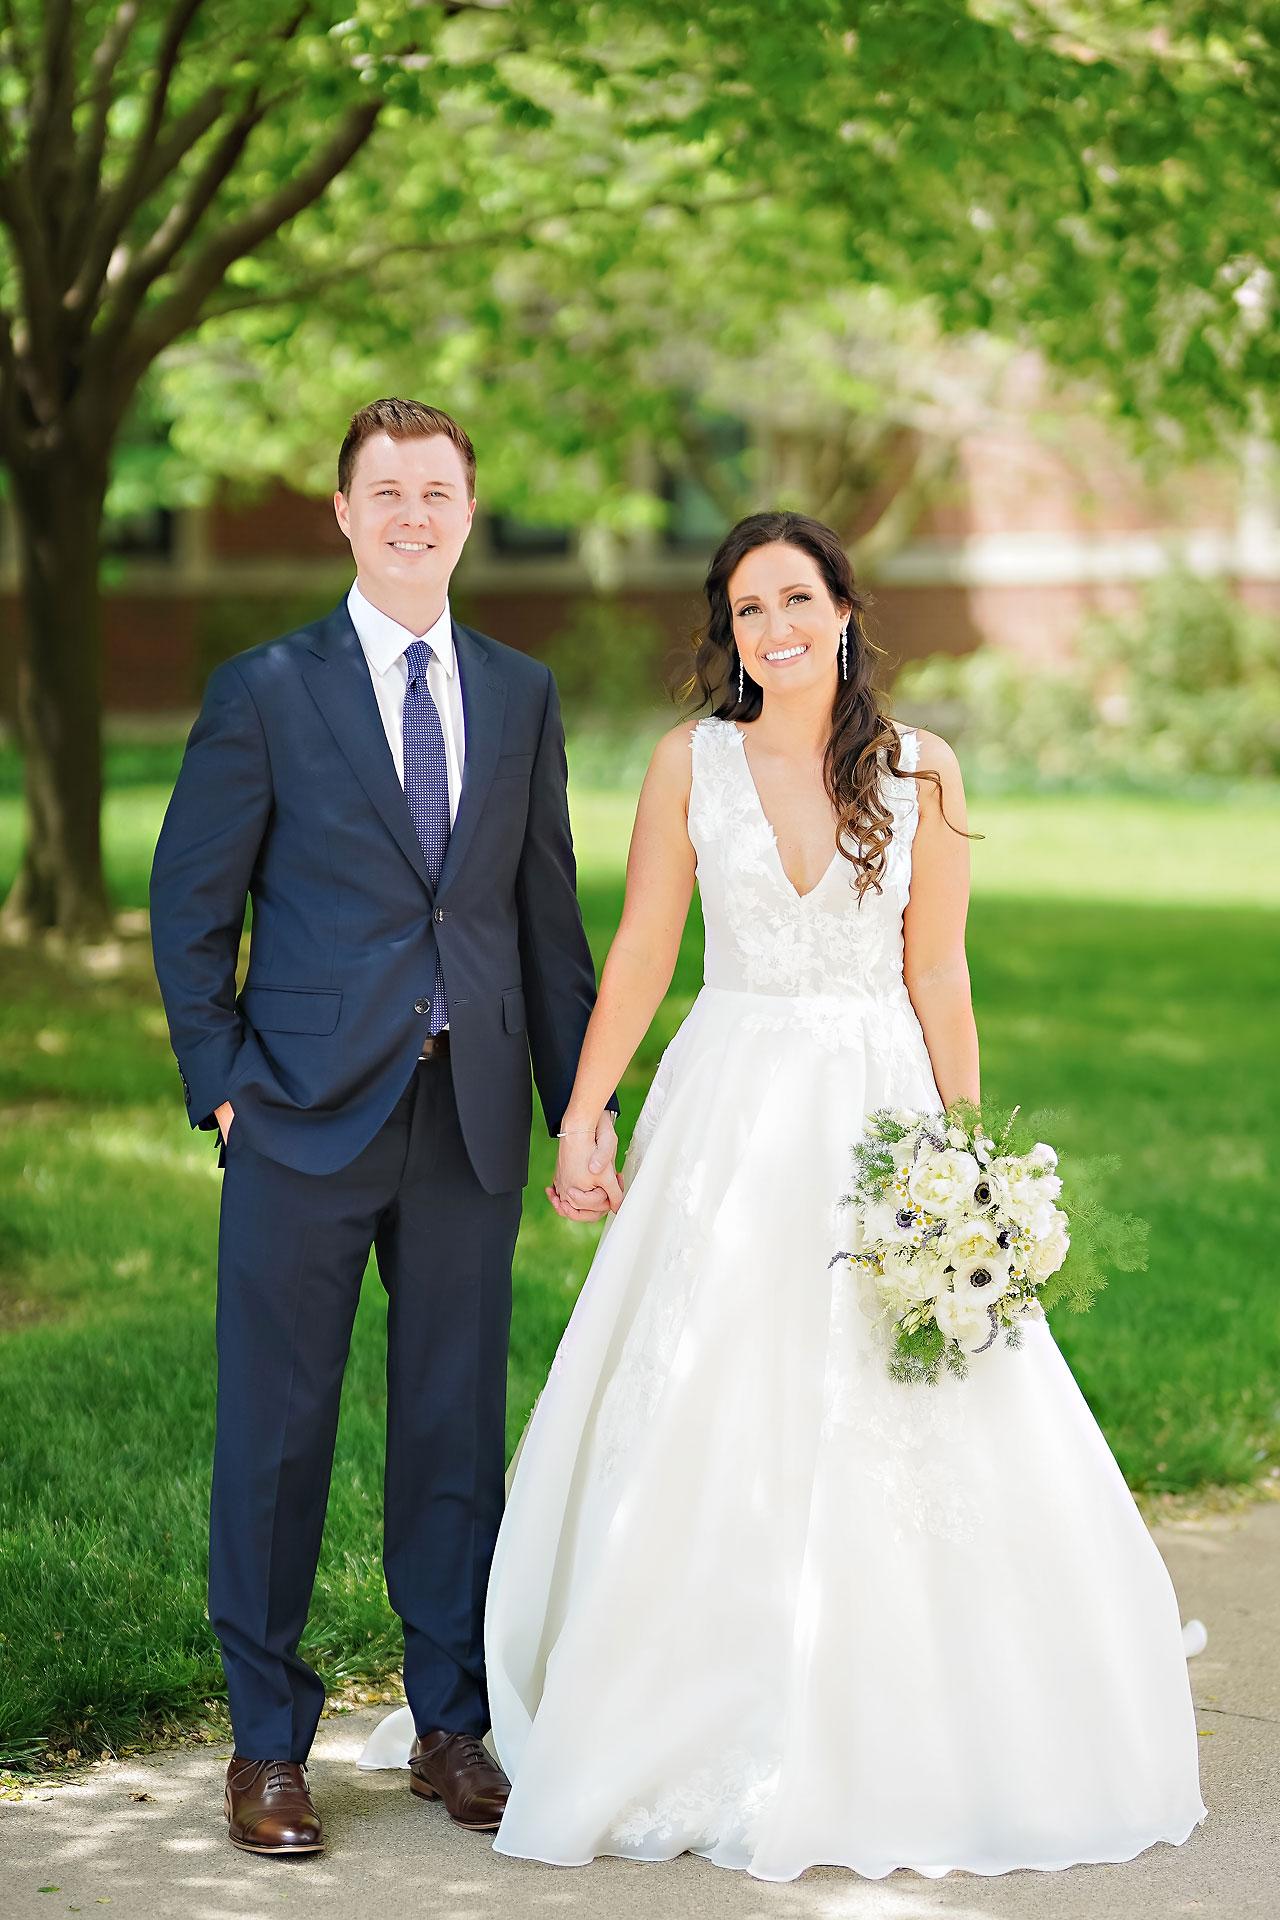 MacKinze John Lafayette Indiana Purdue Wedding 113